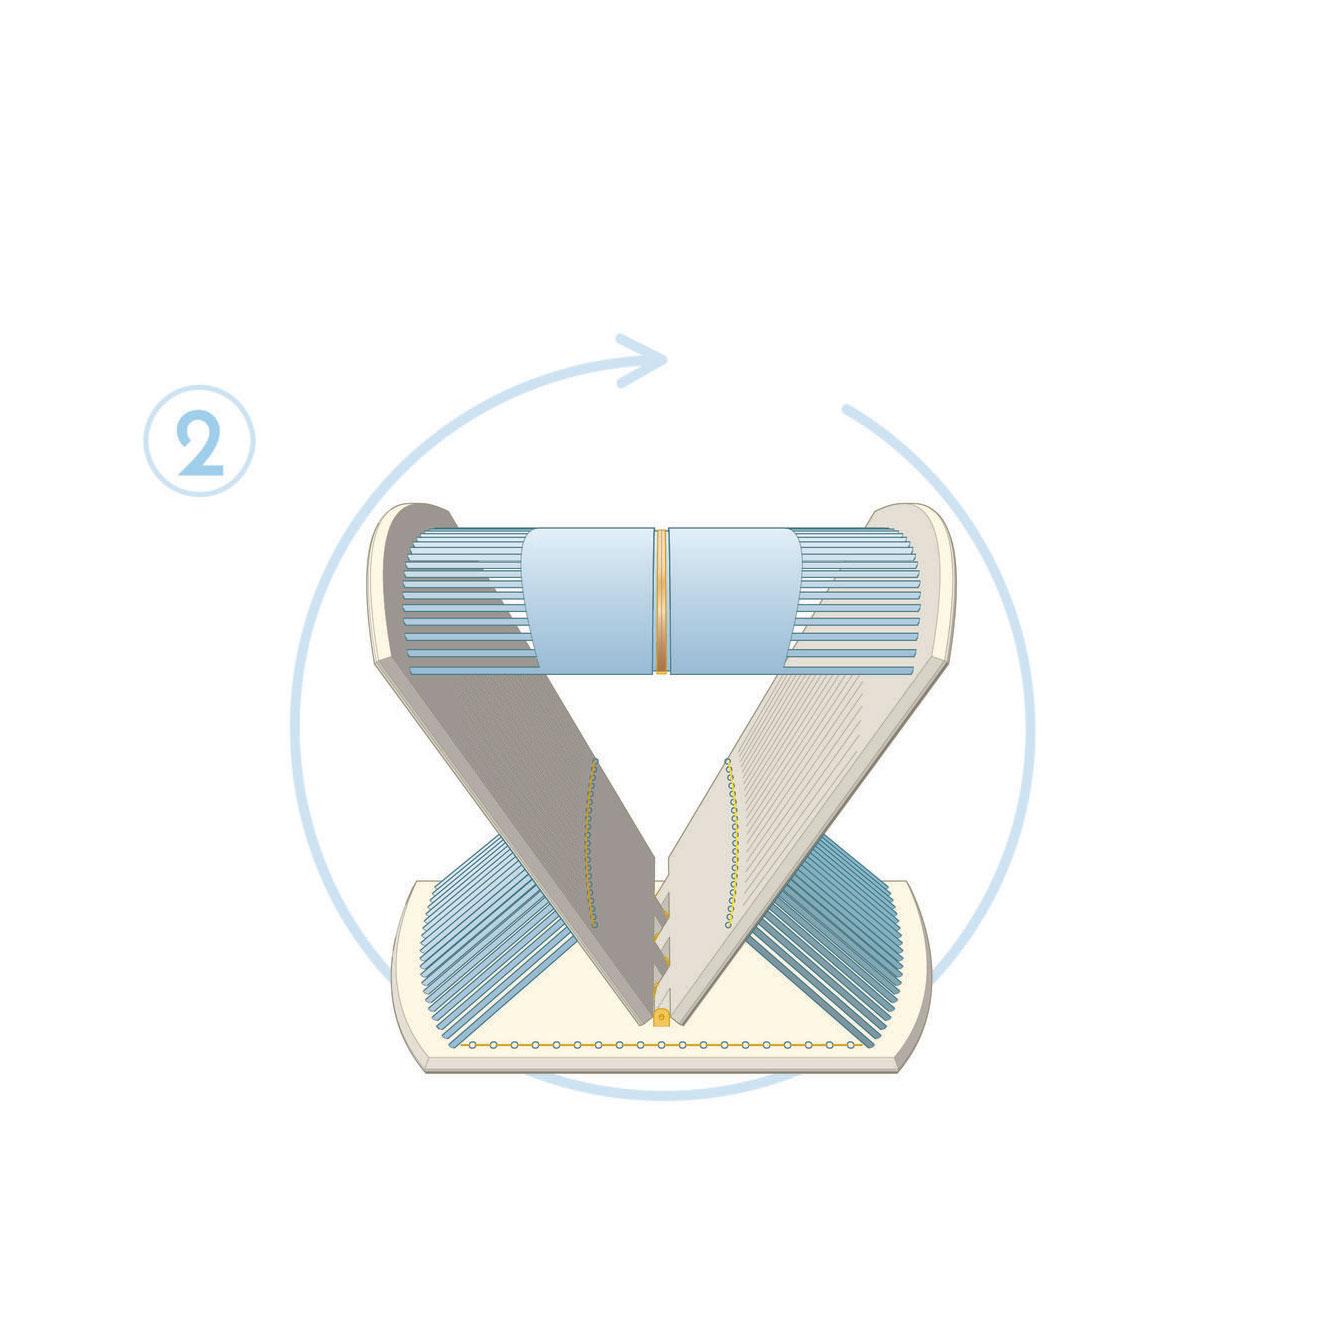 diagram_2.jpg